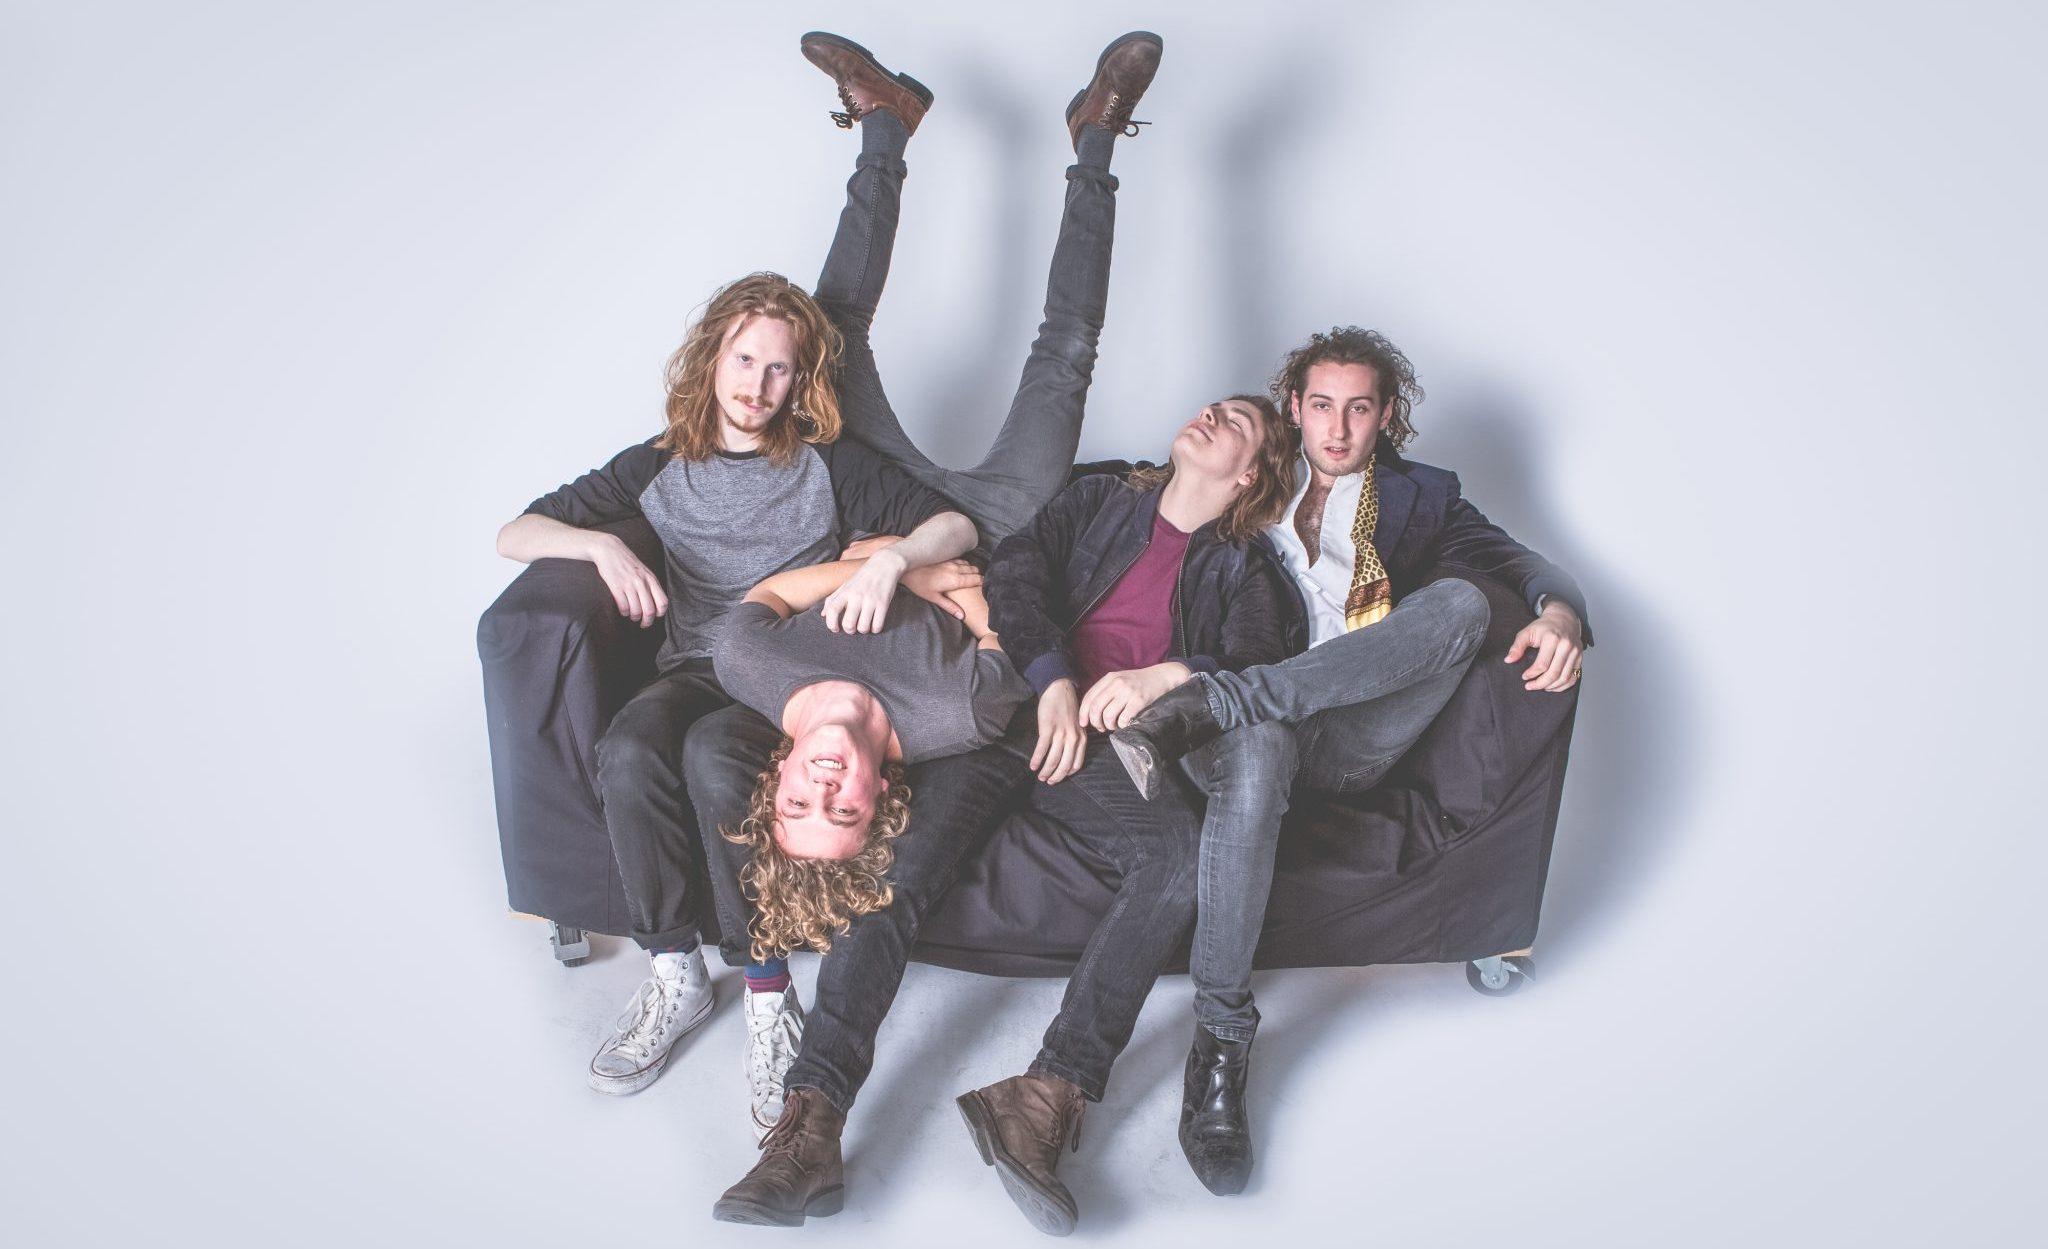 new music alert-lost-by-sea girls-indie rock-indie-indie music-new music-music blog-indie blog-wolf in a suit-wolfinasuit